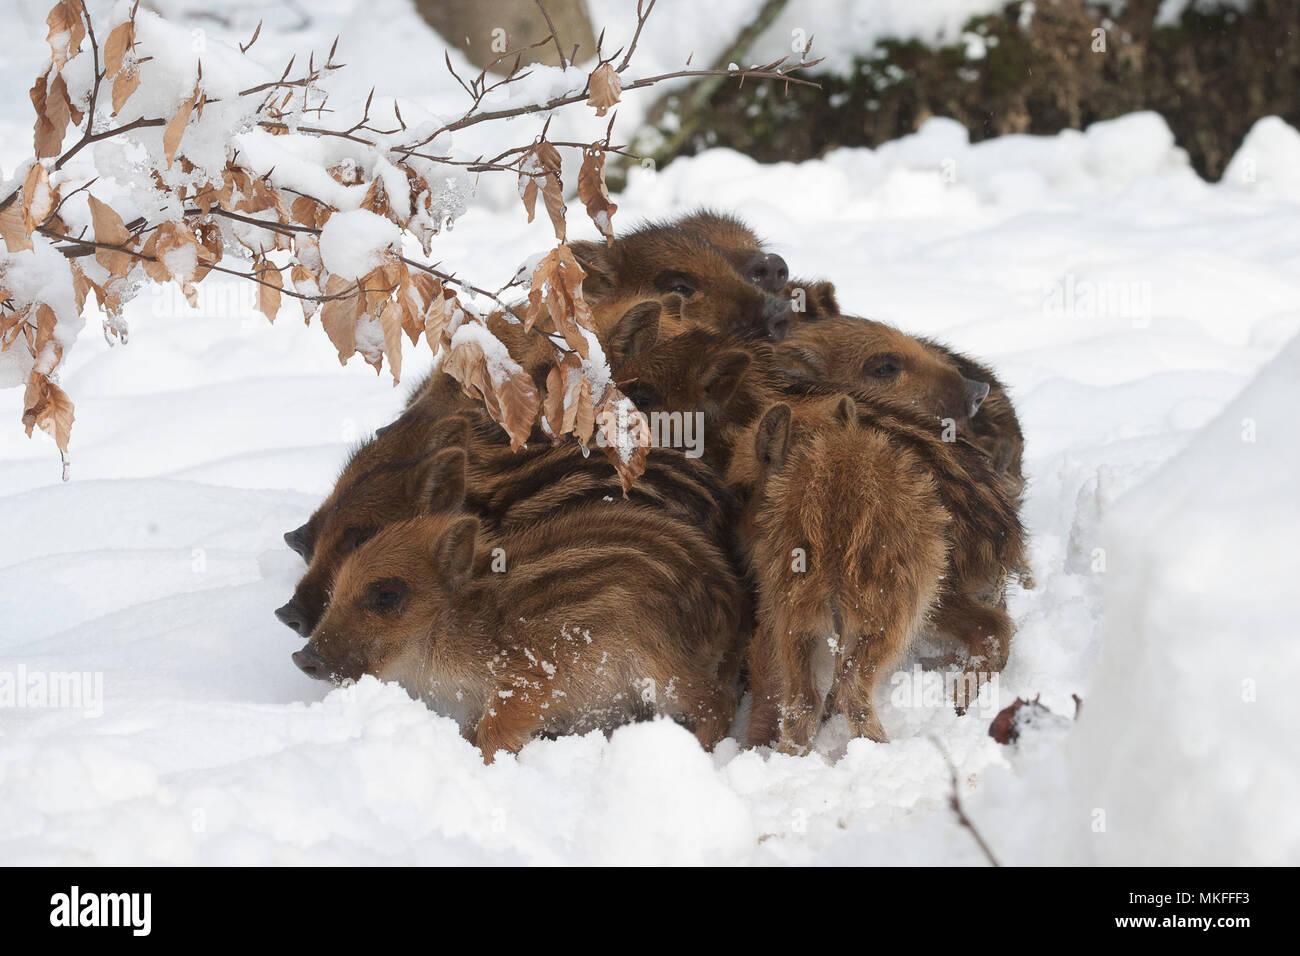 Wild boar (Sus scrofa) piglets in a snowy undergrowth, Ardennes, Belgium - Stock Image